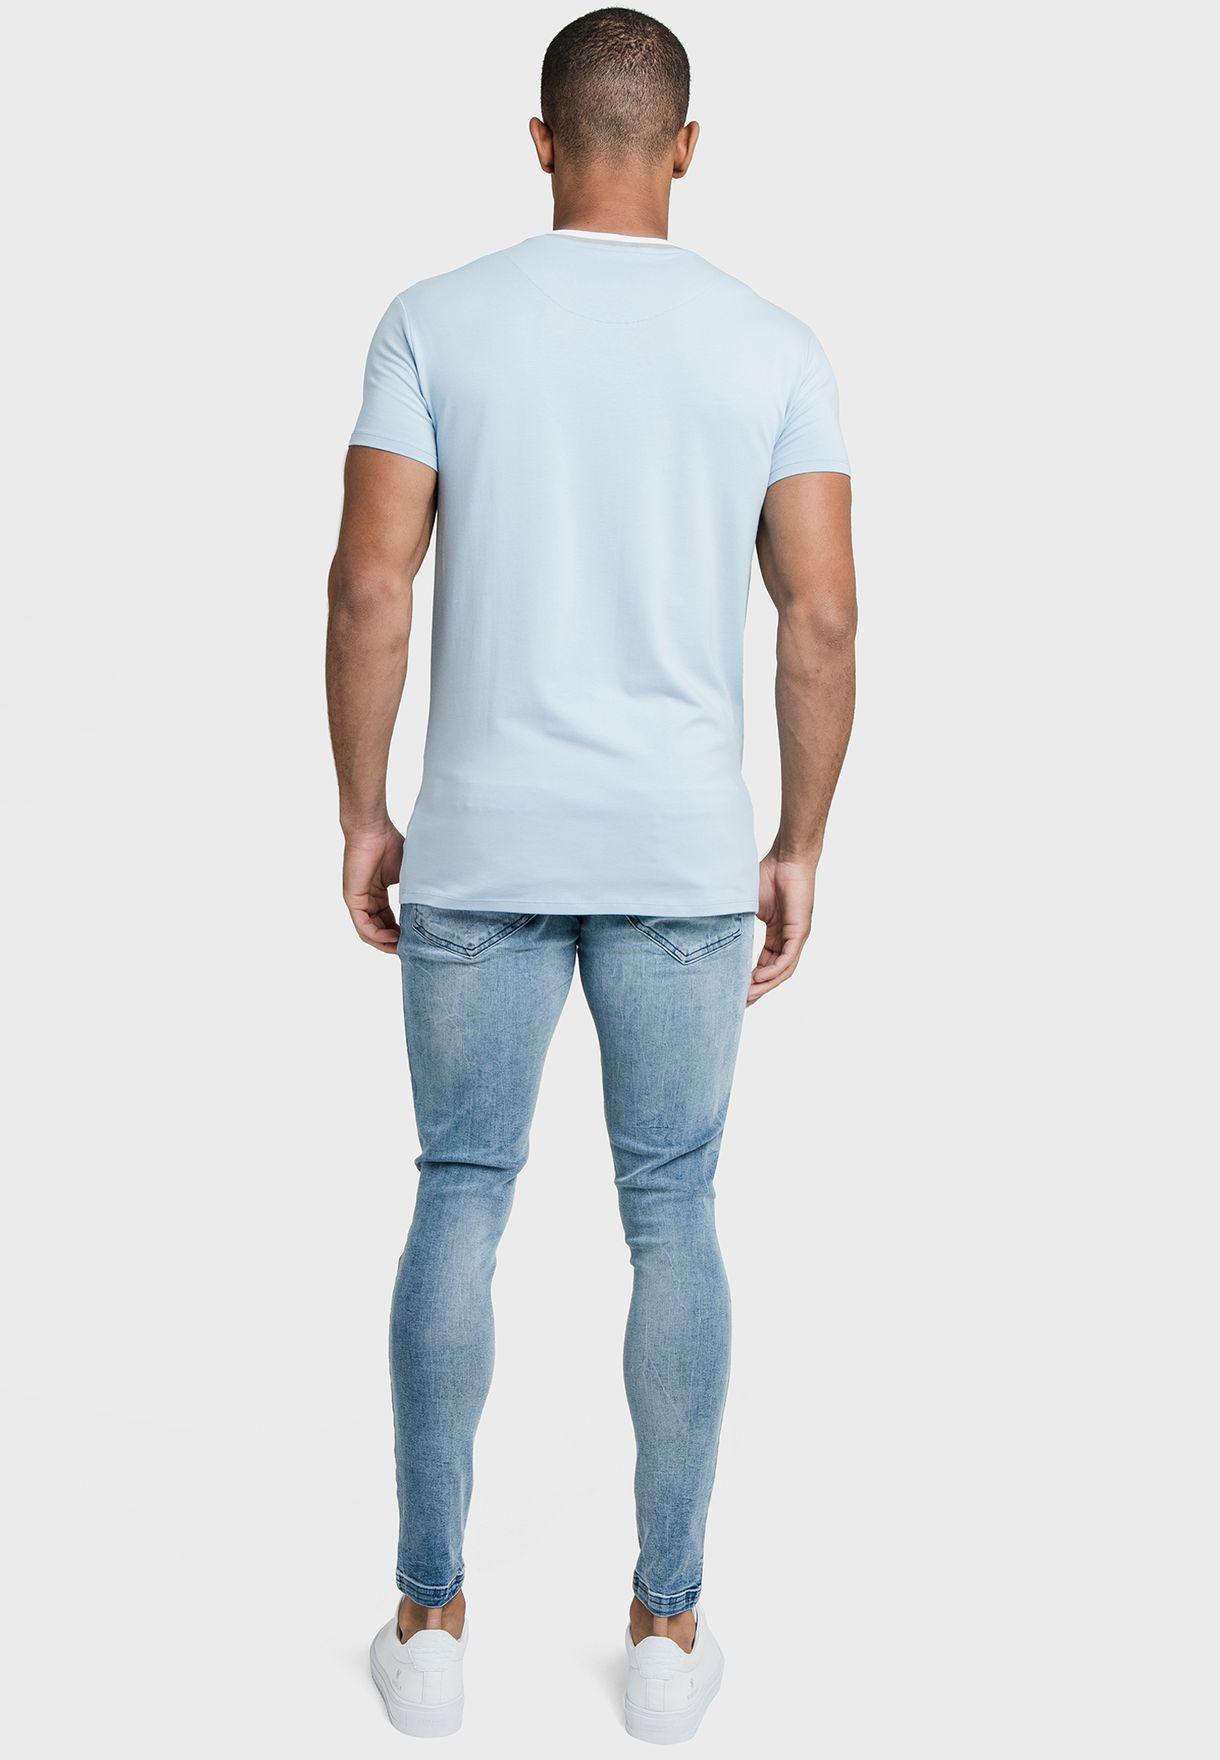 Ribbed Gym T-Shirt